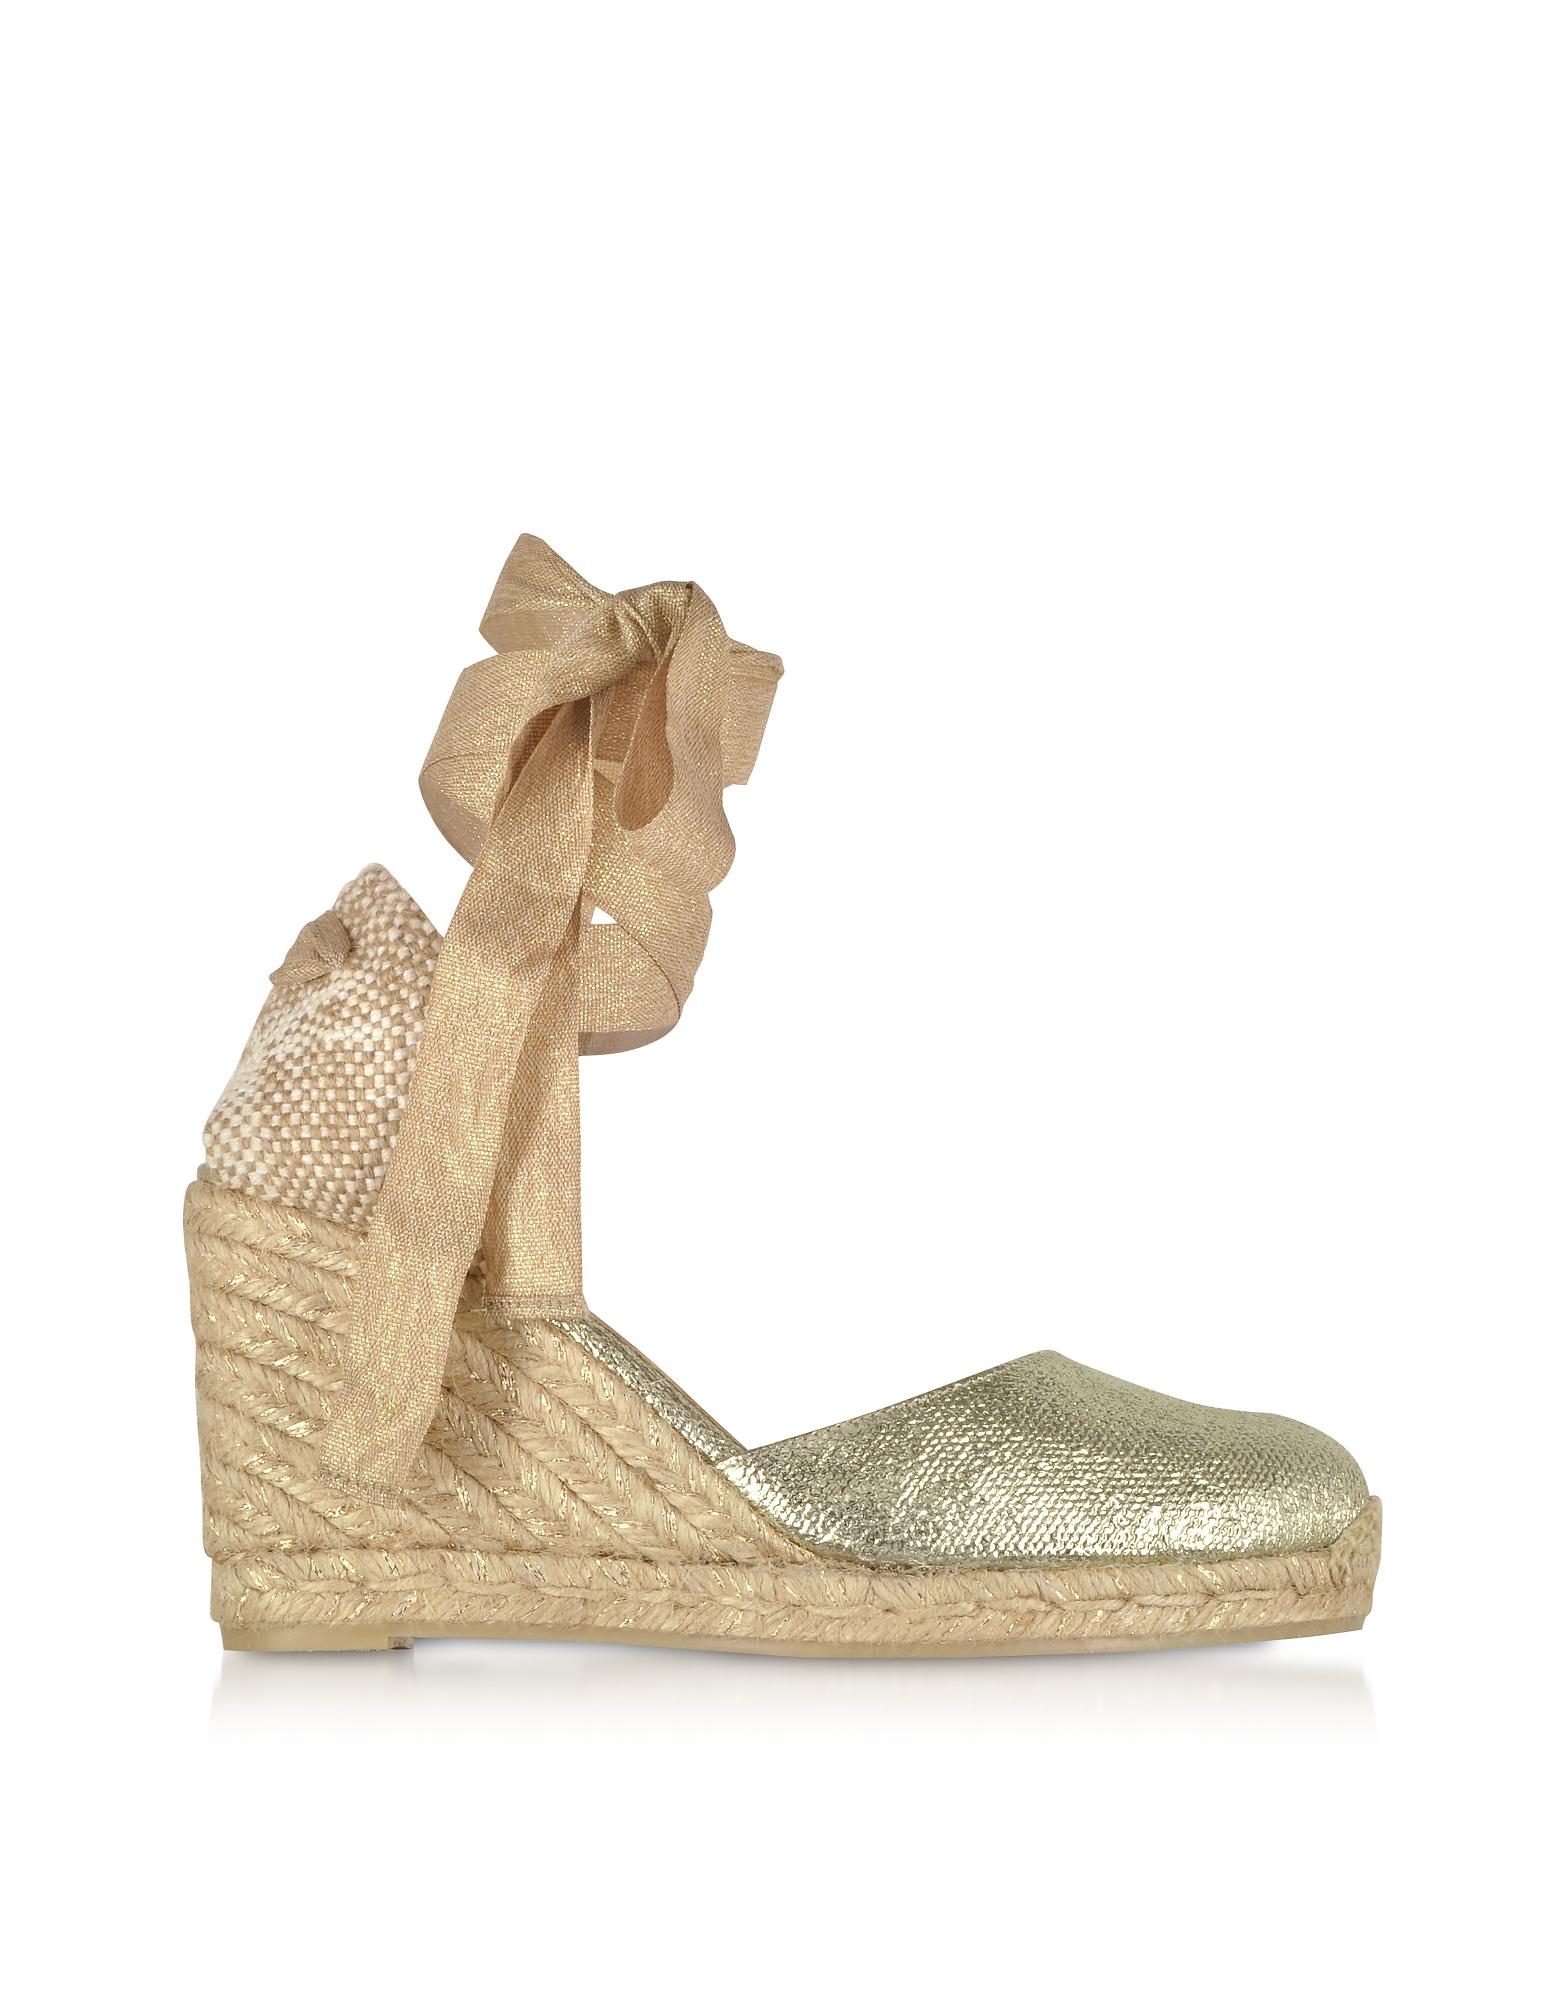 Castaner Shoes, Carina Golden Canvas Wedge Espadrilles